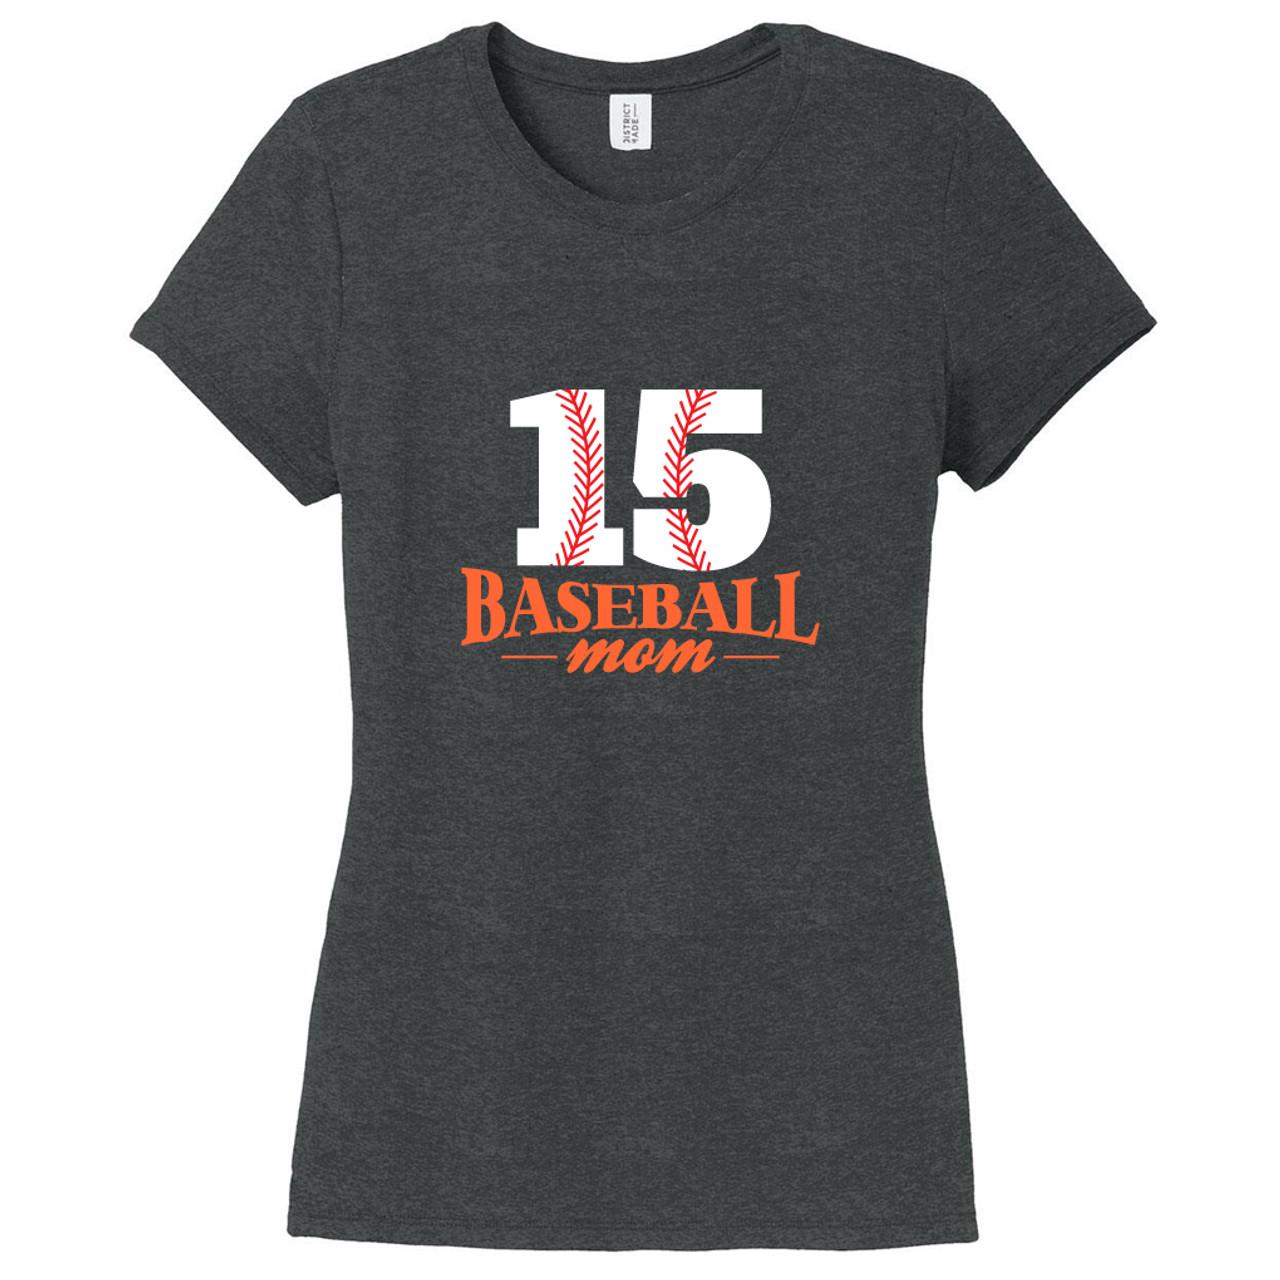 7d3e1f23 Black Frost Custom Baseball Mom Women's Fitted T-Shirt | Sweetums Shirt